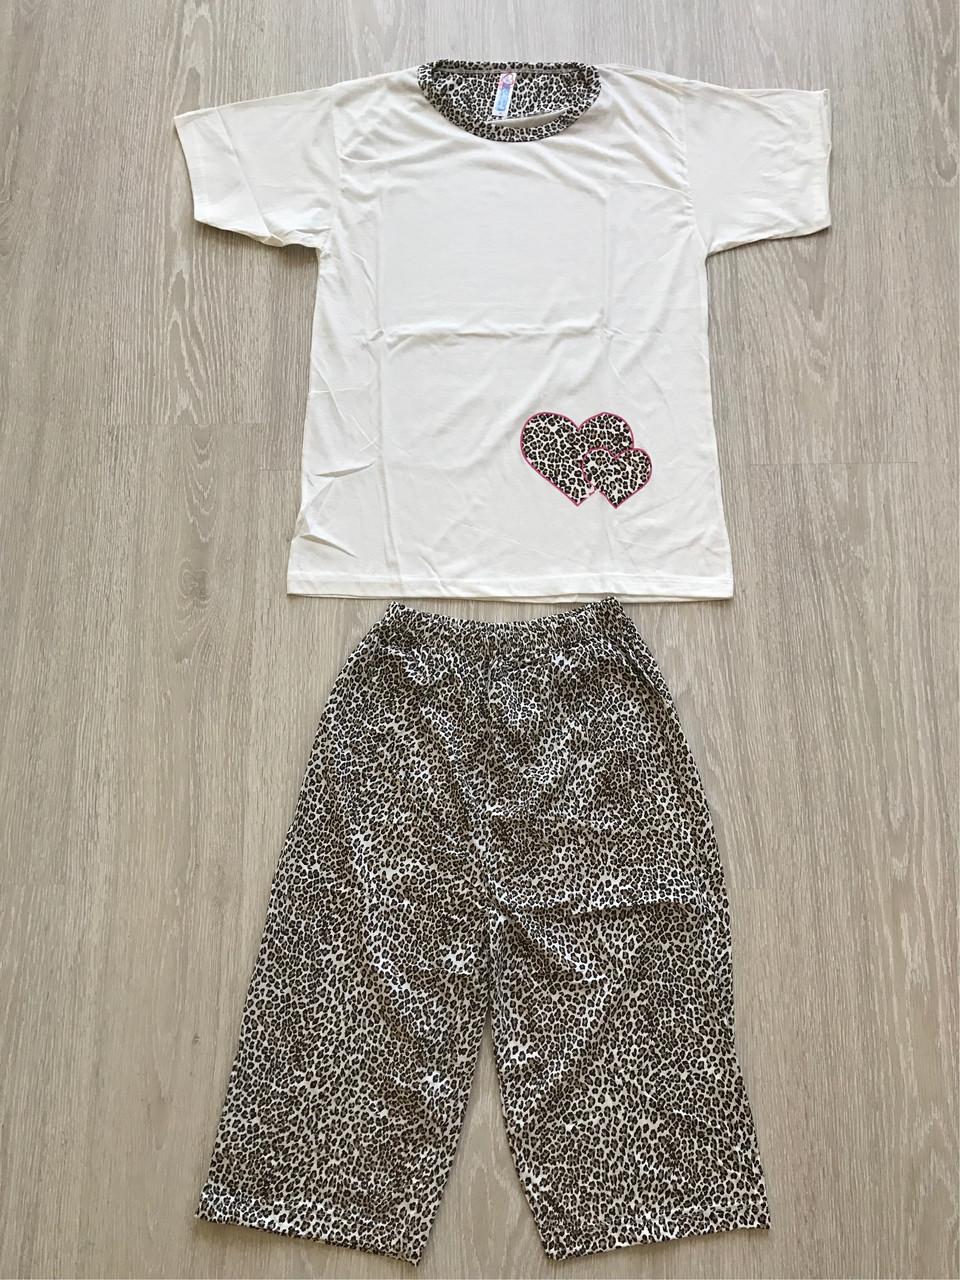 Женская пижама Asma Леопард капри  продажа 87f1dfa42cdab